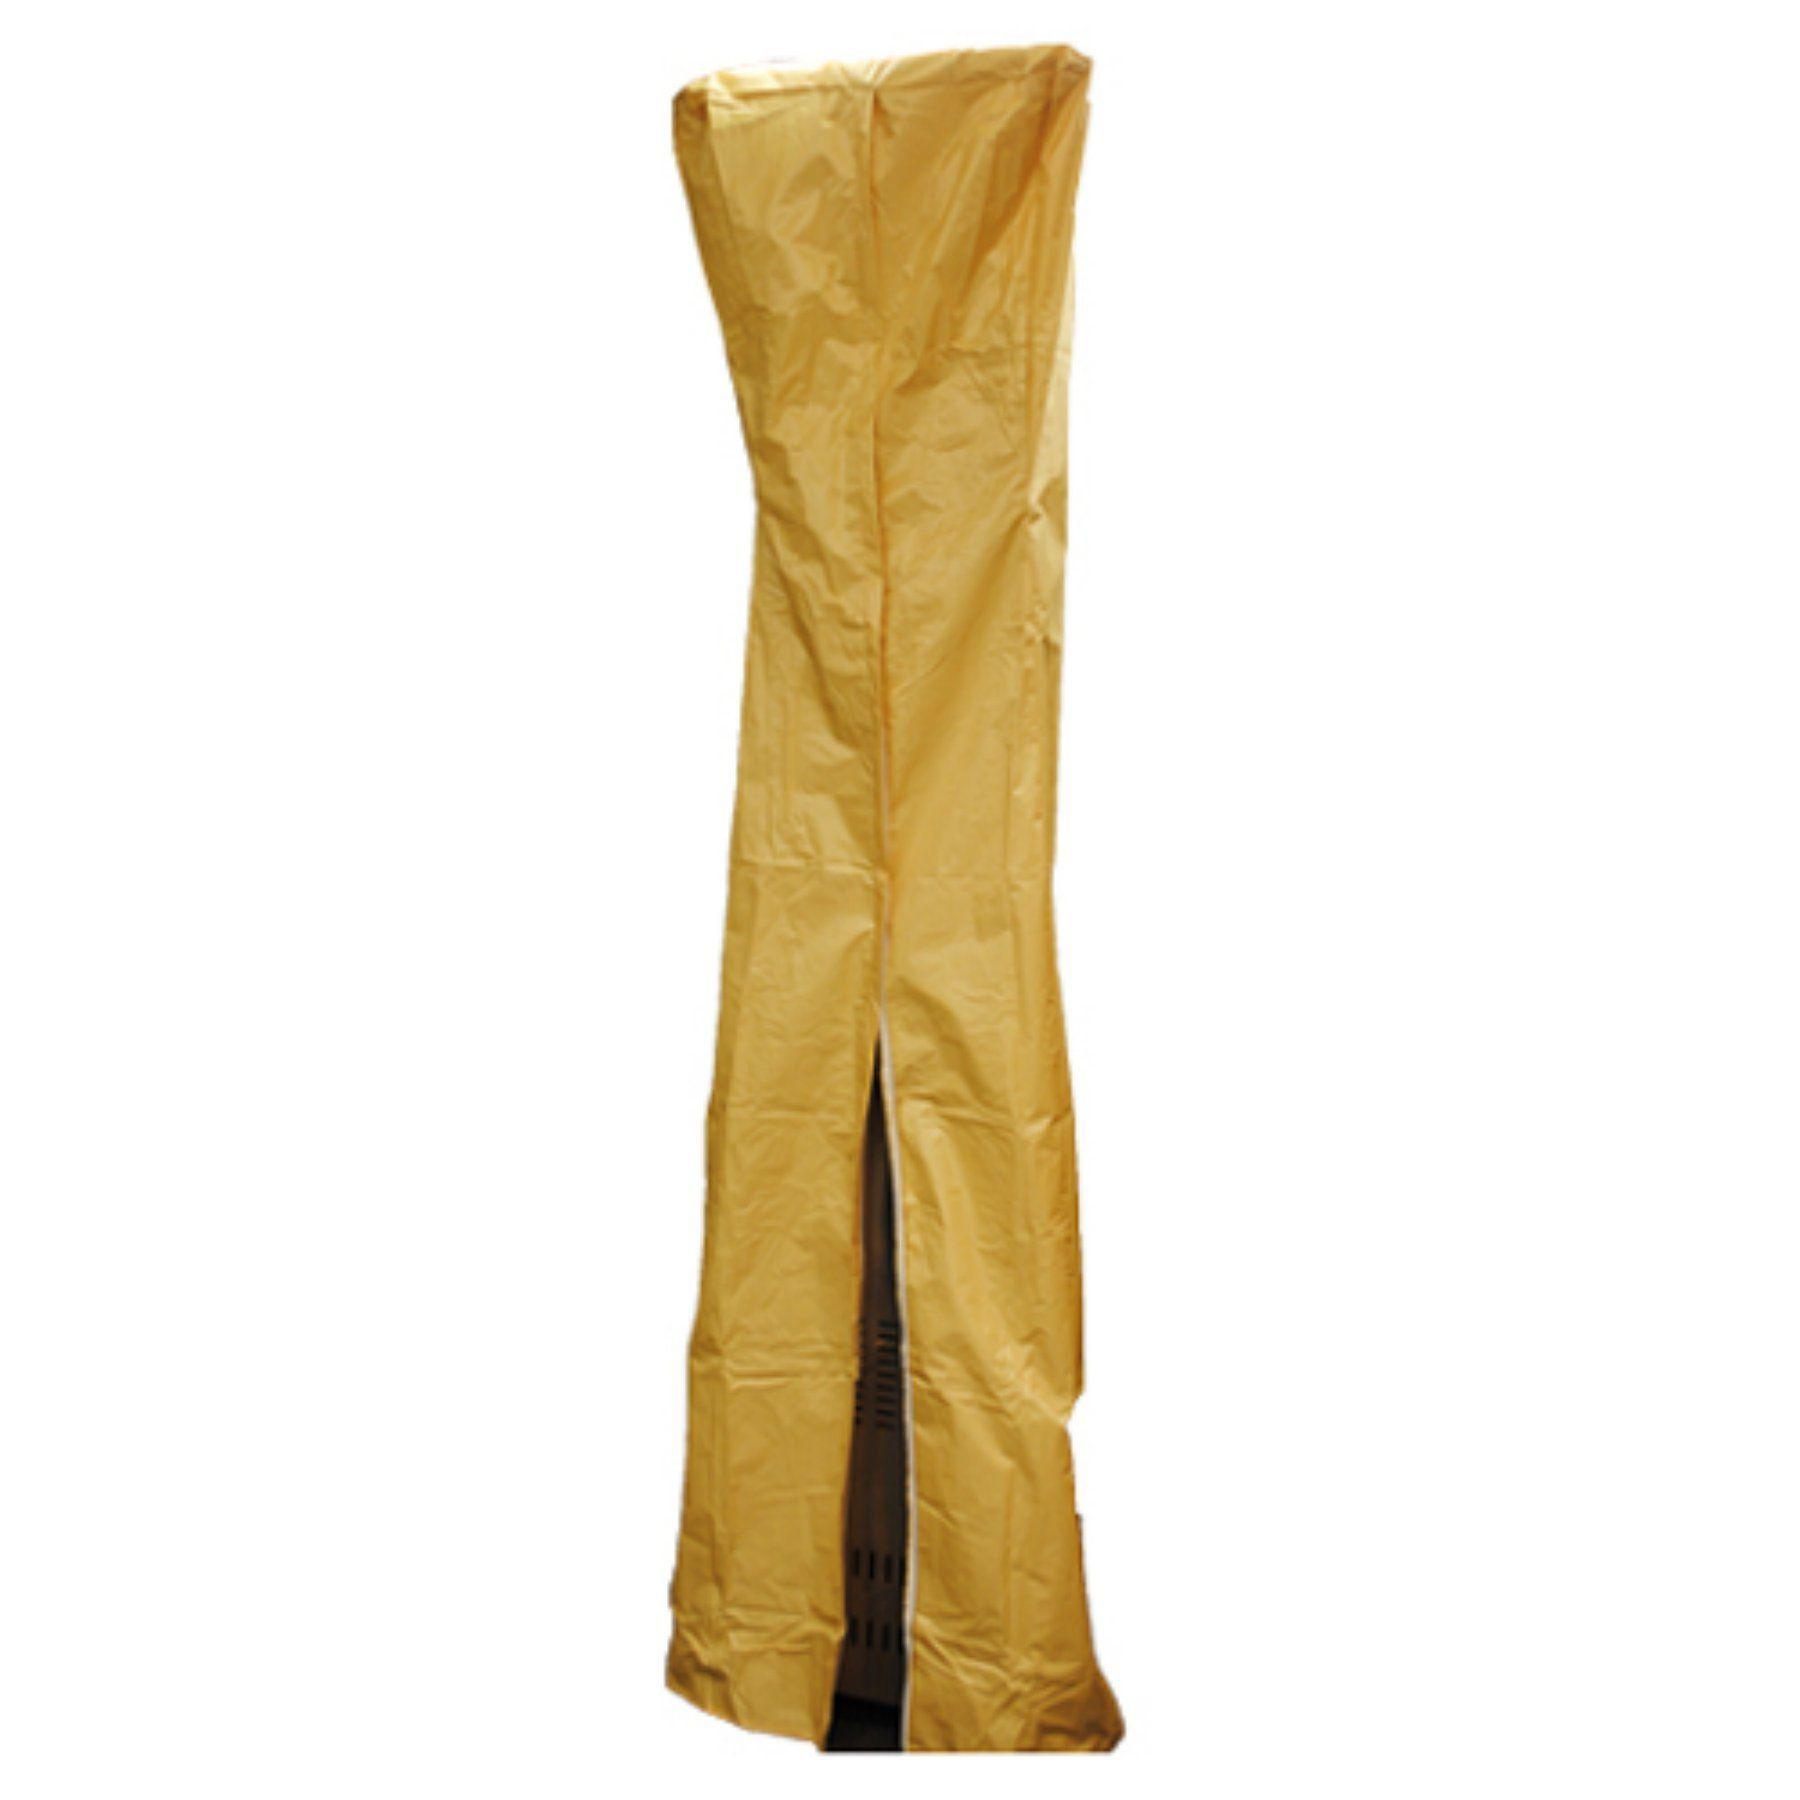 SUNHEAT Triangle Patio Heater Cover